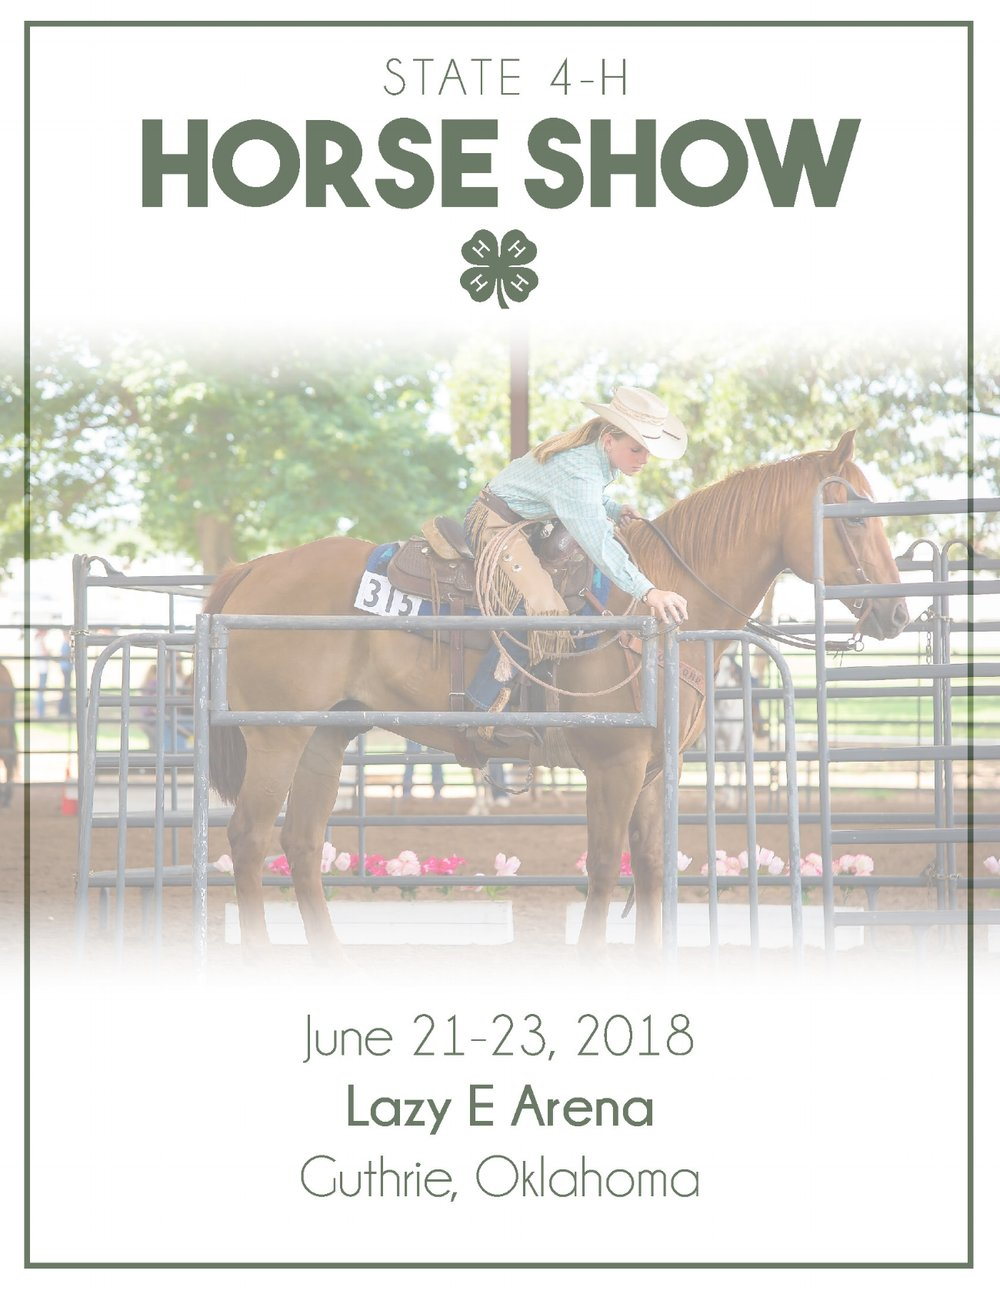 State 4-H Horse Show WHITE.jpg